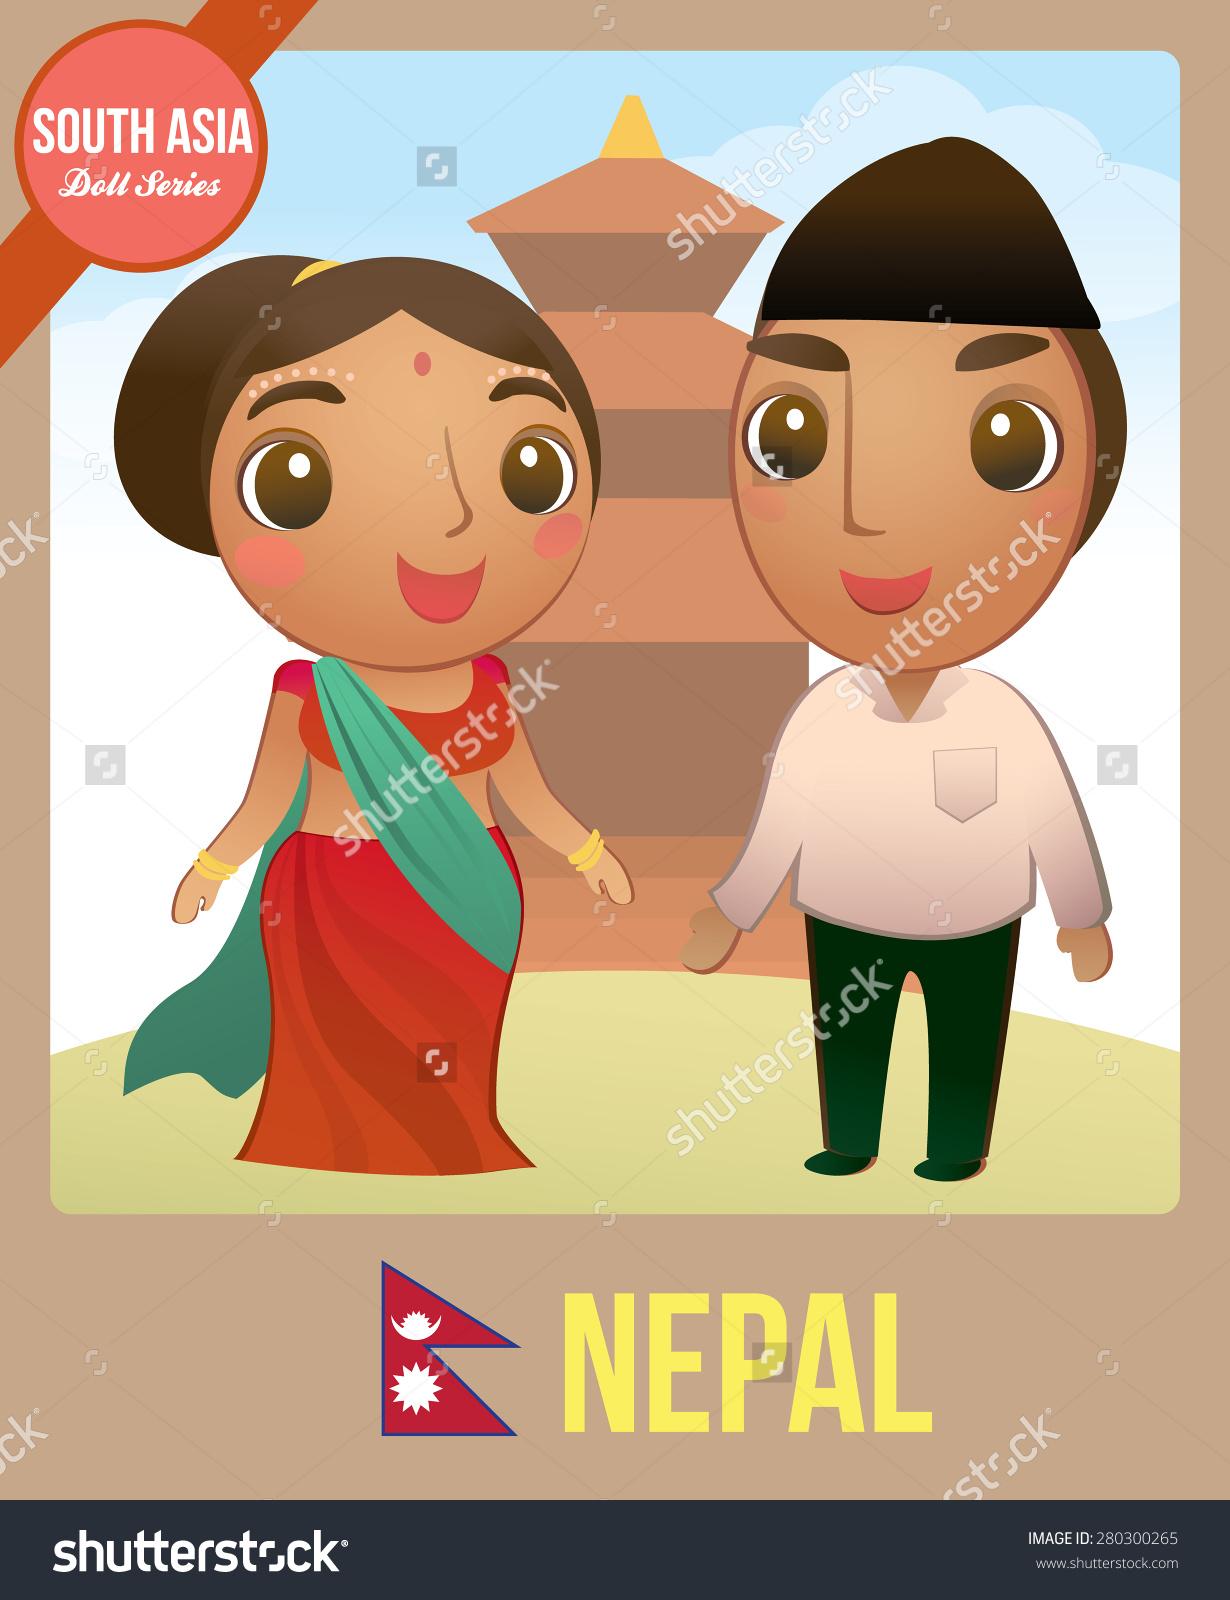 Cute Couple Doll Nepali Symbol Nepal Stock Vector 280300265.